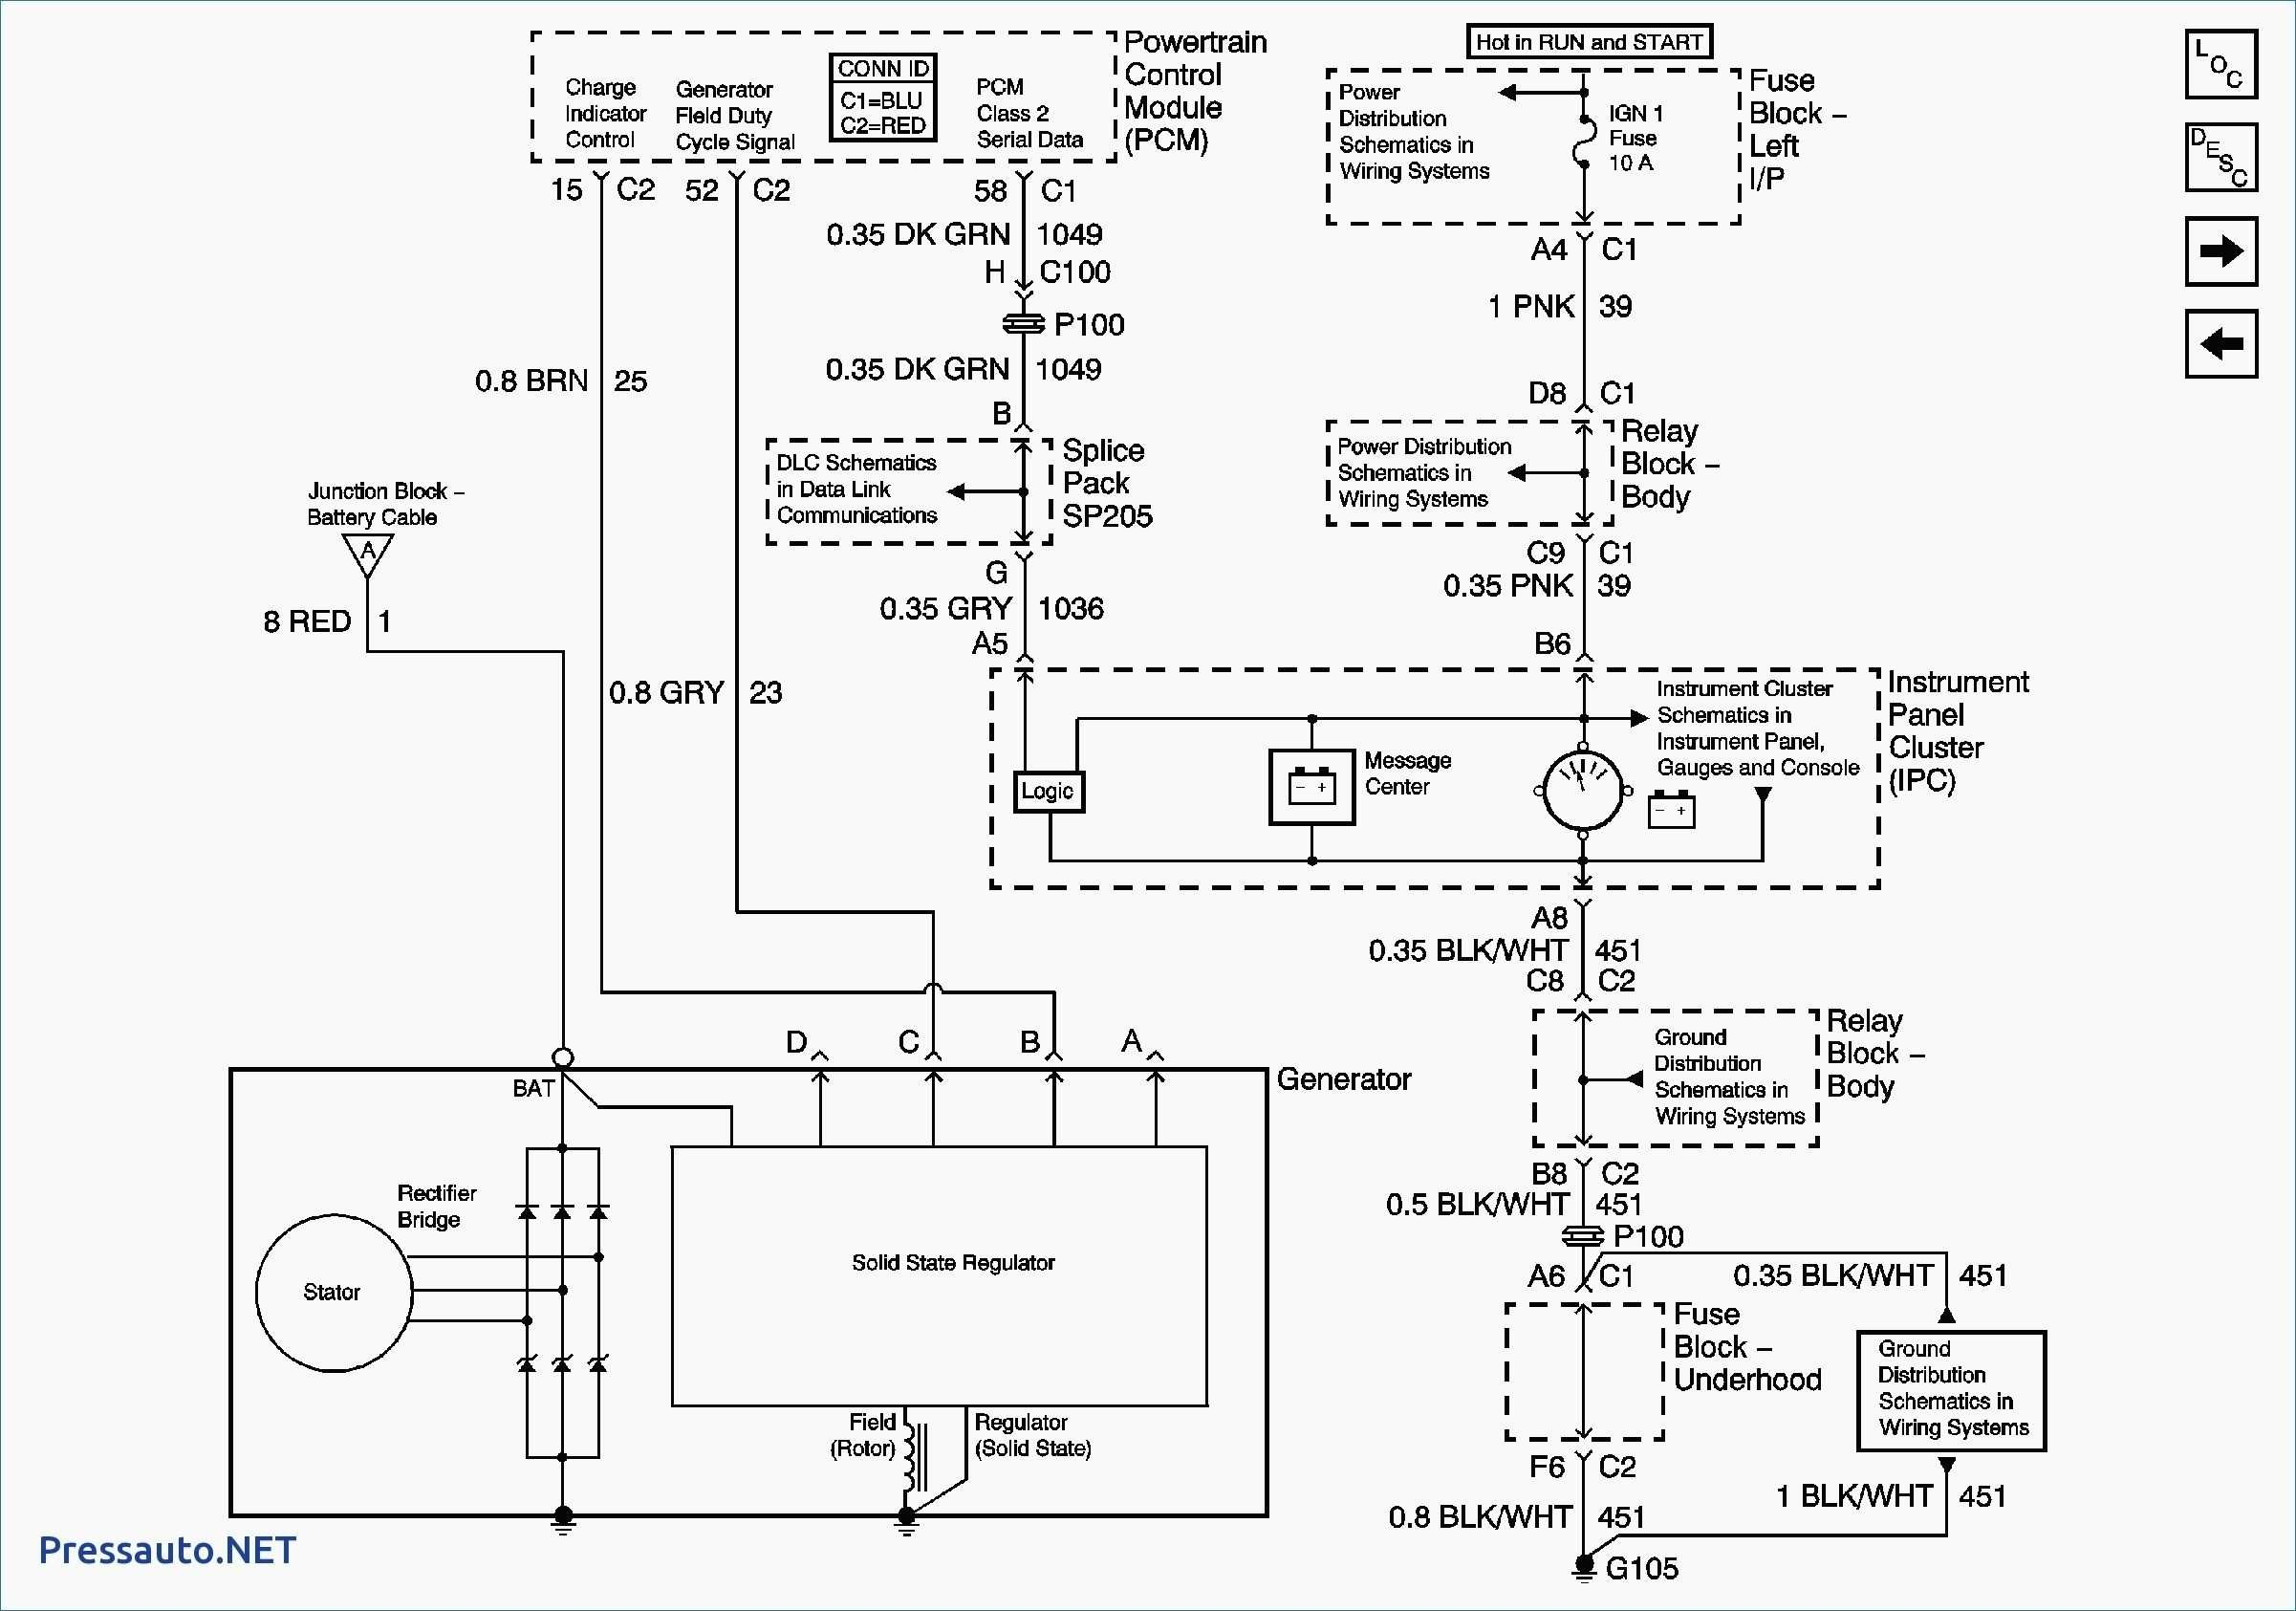 2003 Audi A4 Engine Diagram Audi A4 Engine Diagram Experts Wiring Diagram • Of 2003 Audi A4 Engine Diagram